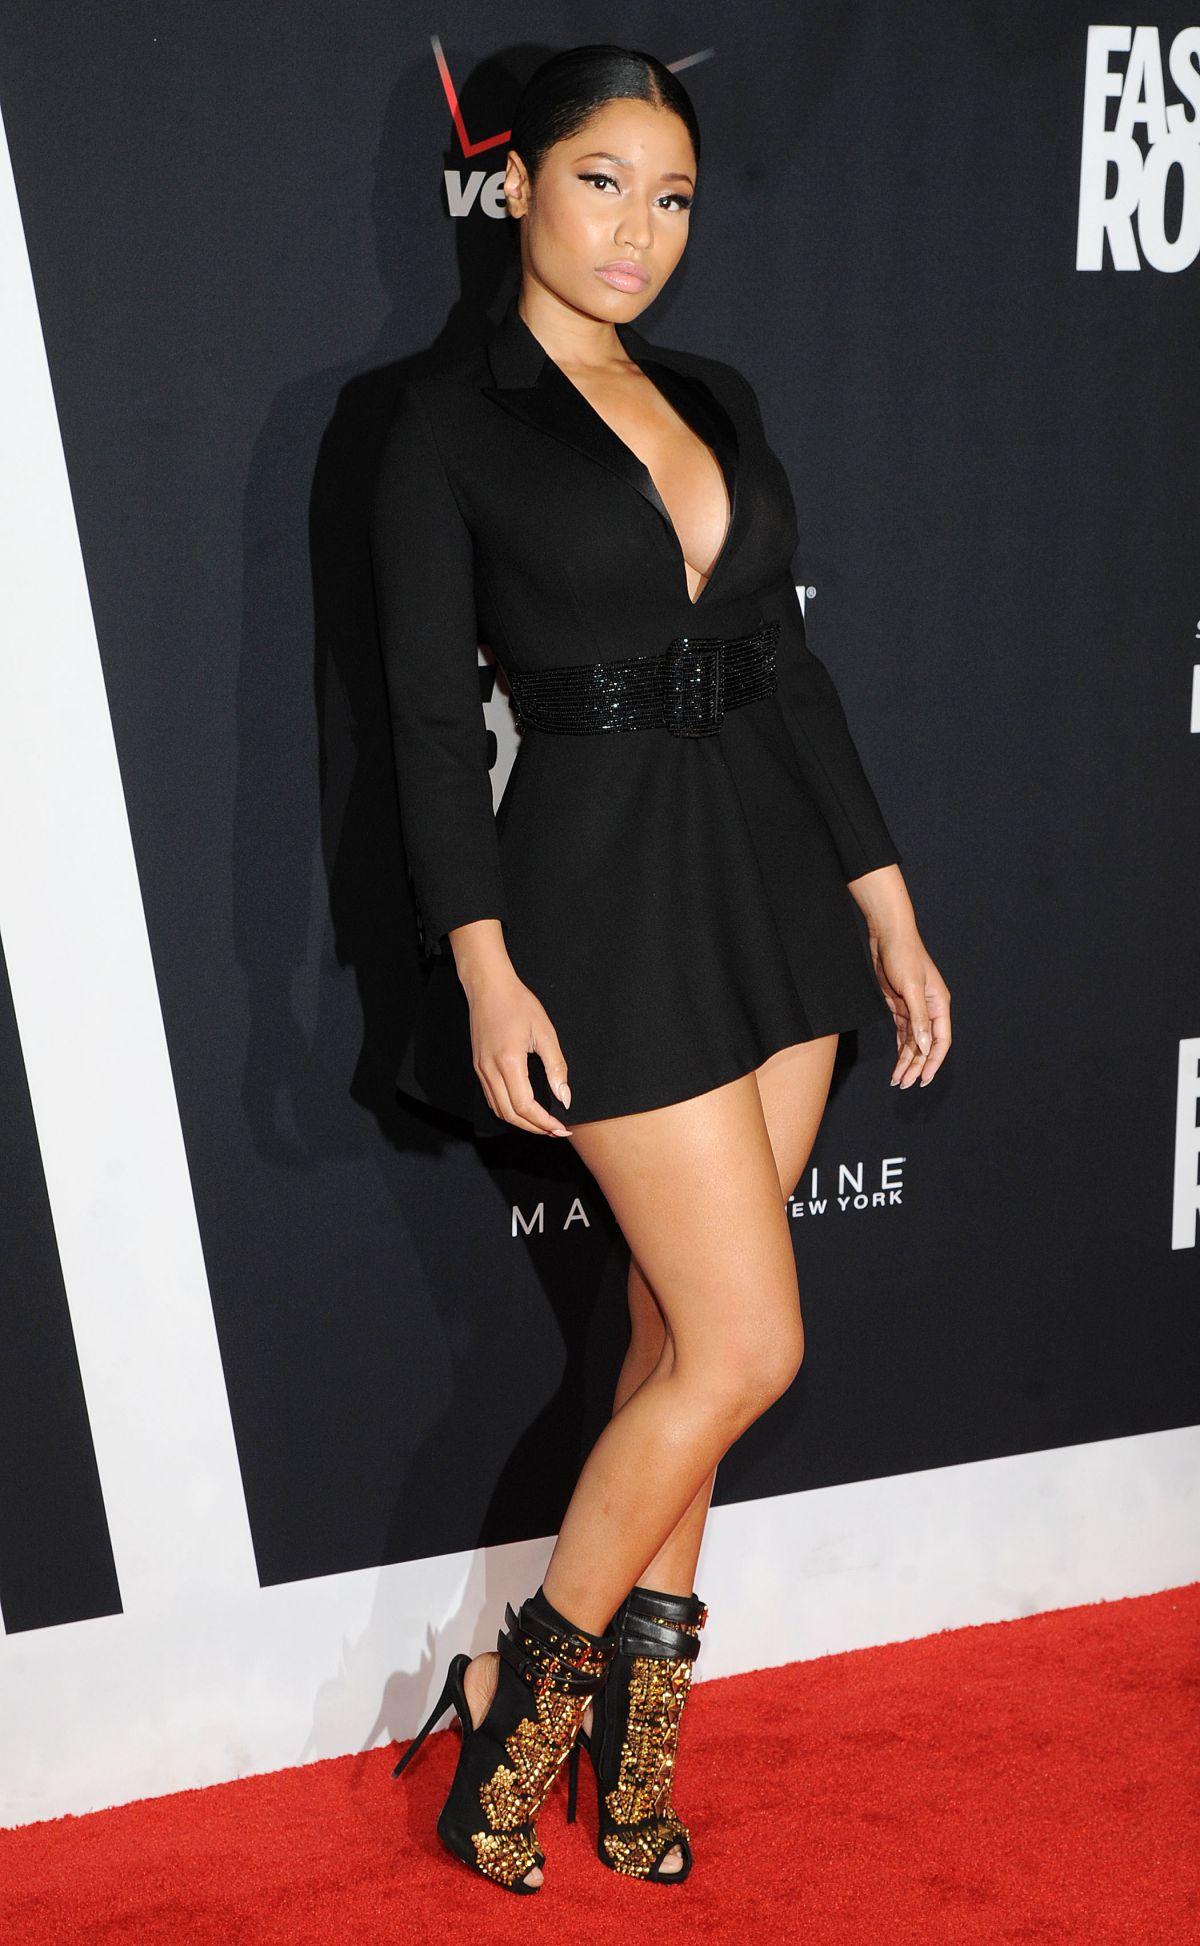 NICKI MINAJ at Fashion Rocks 2014 in New York - HawtCelebs